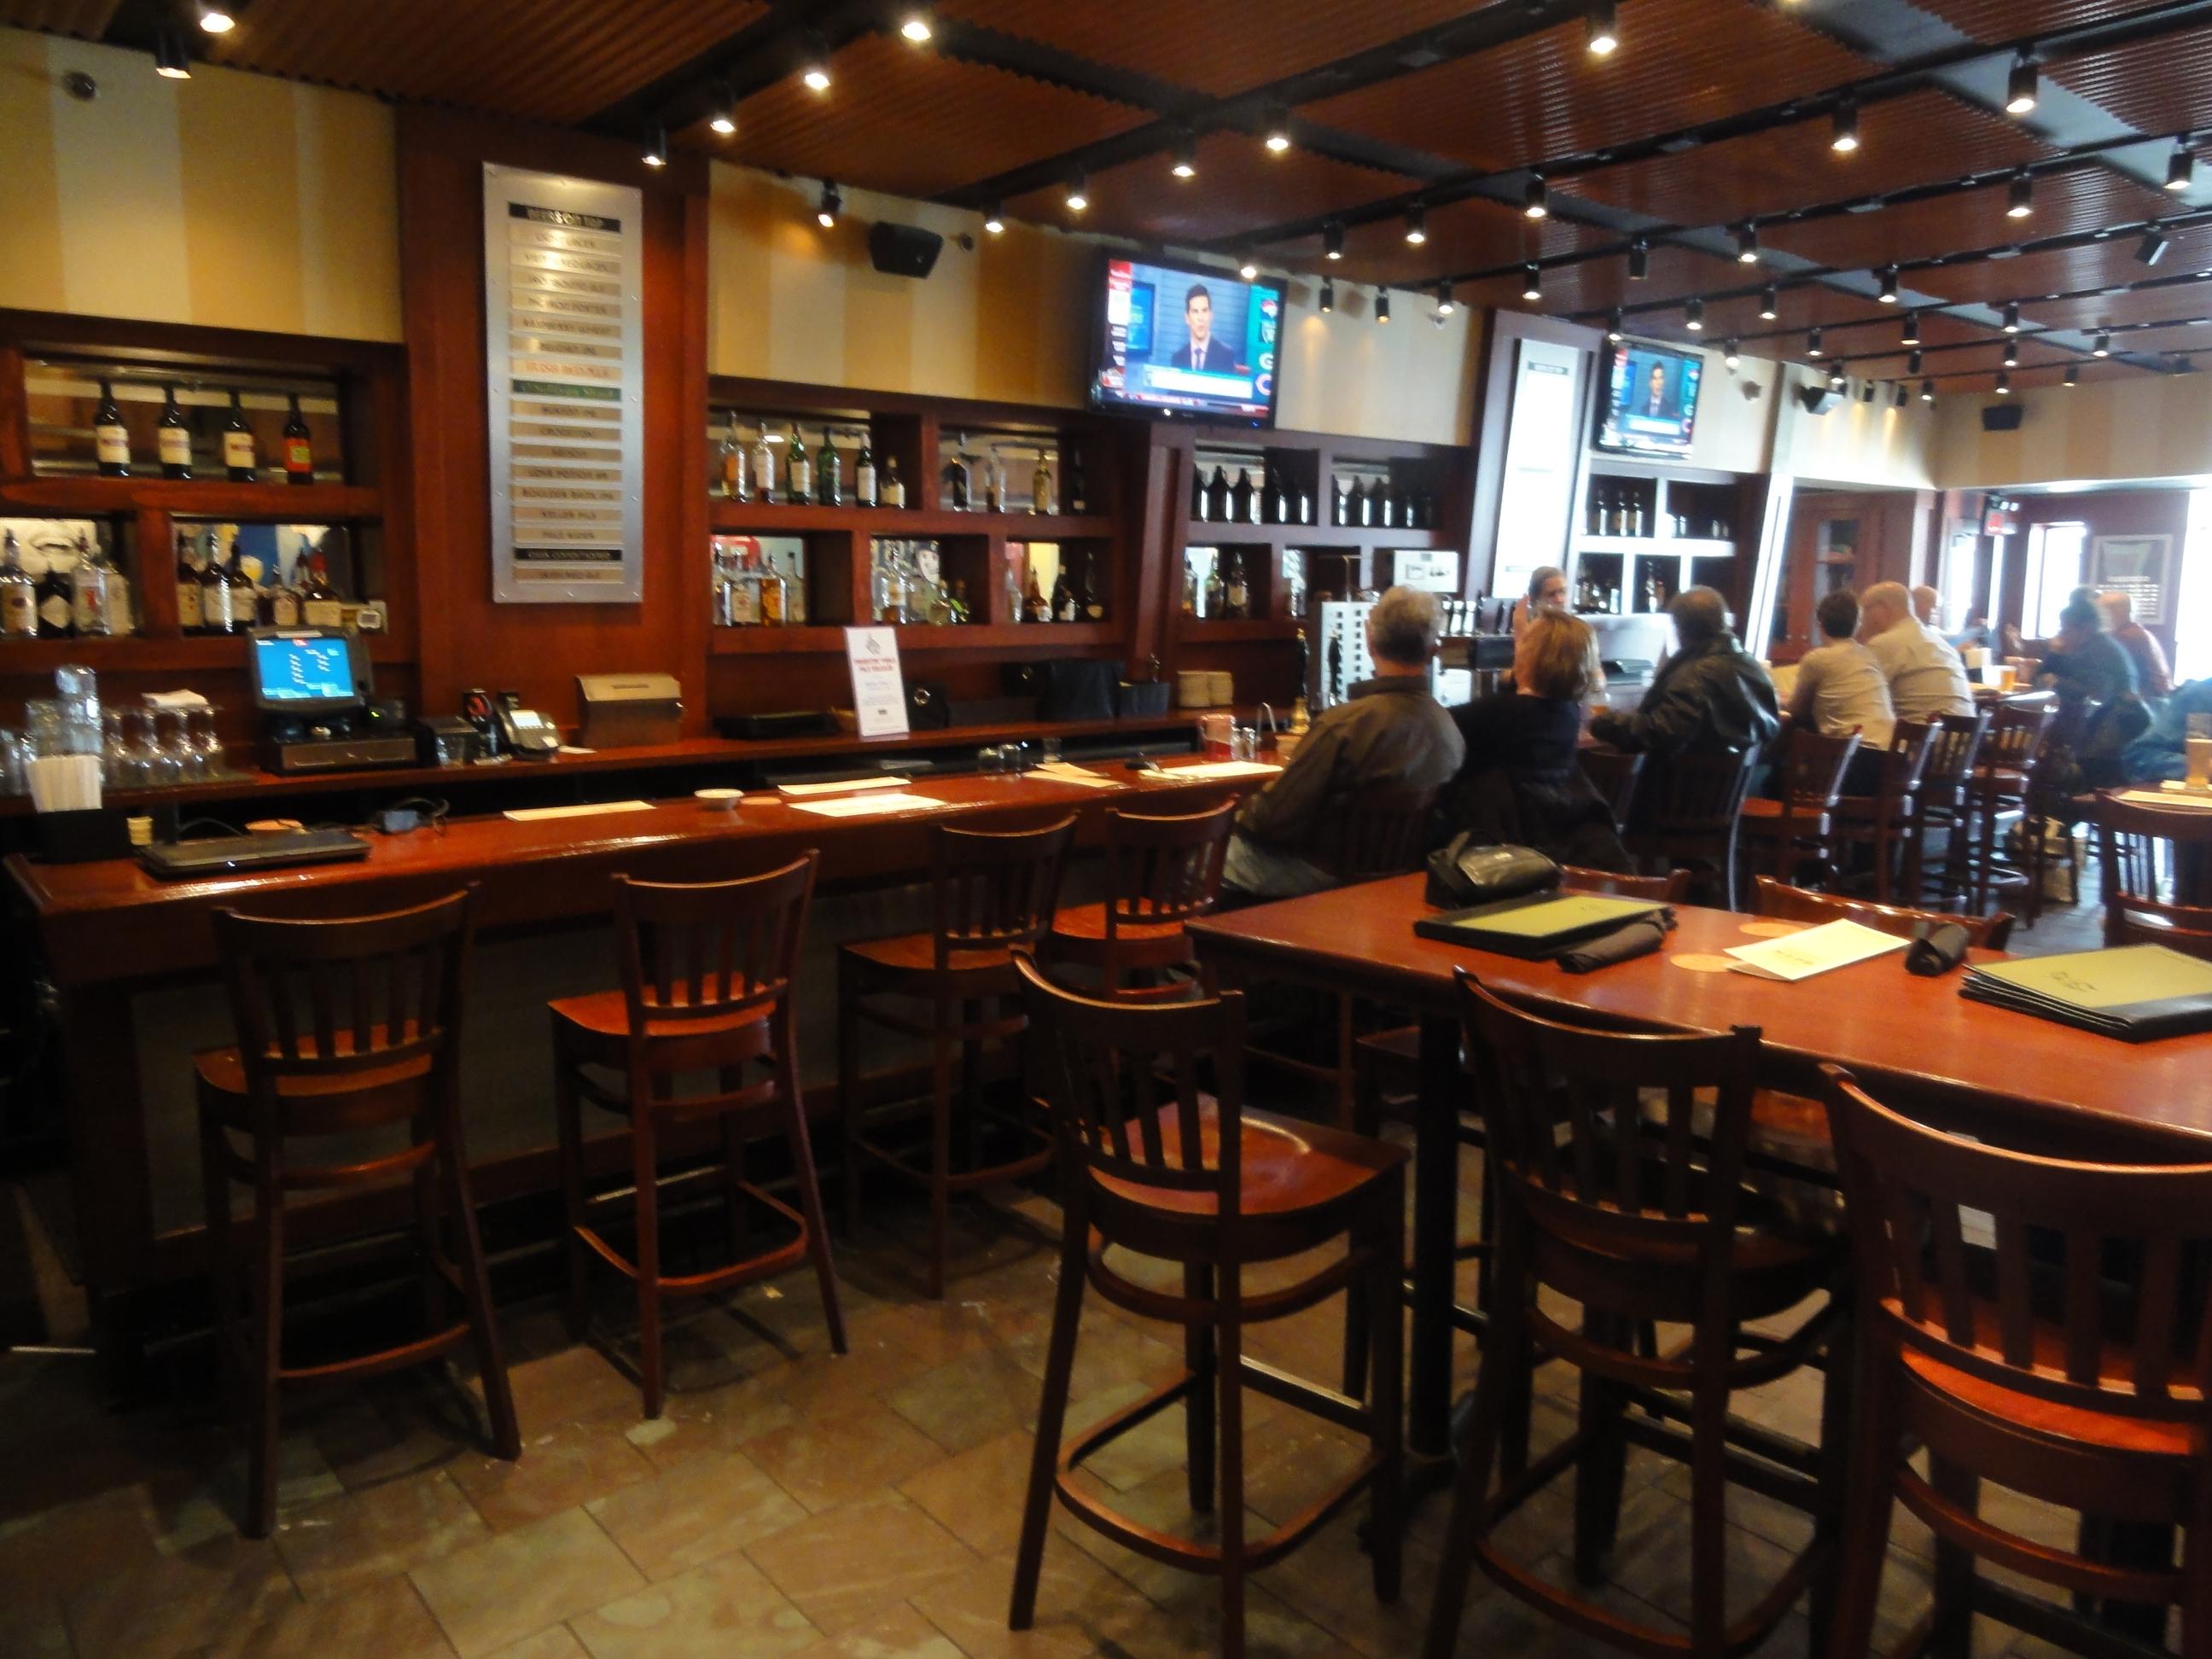 91 Iron Hill Brewery Restaurant In Newark De Brews